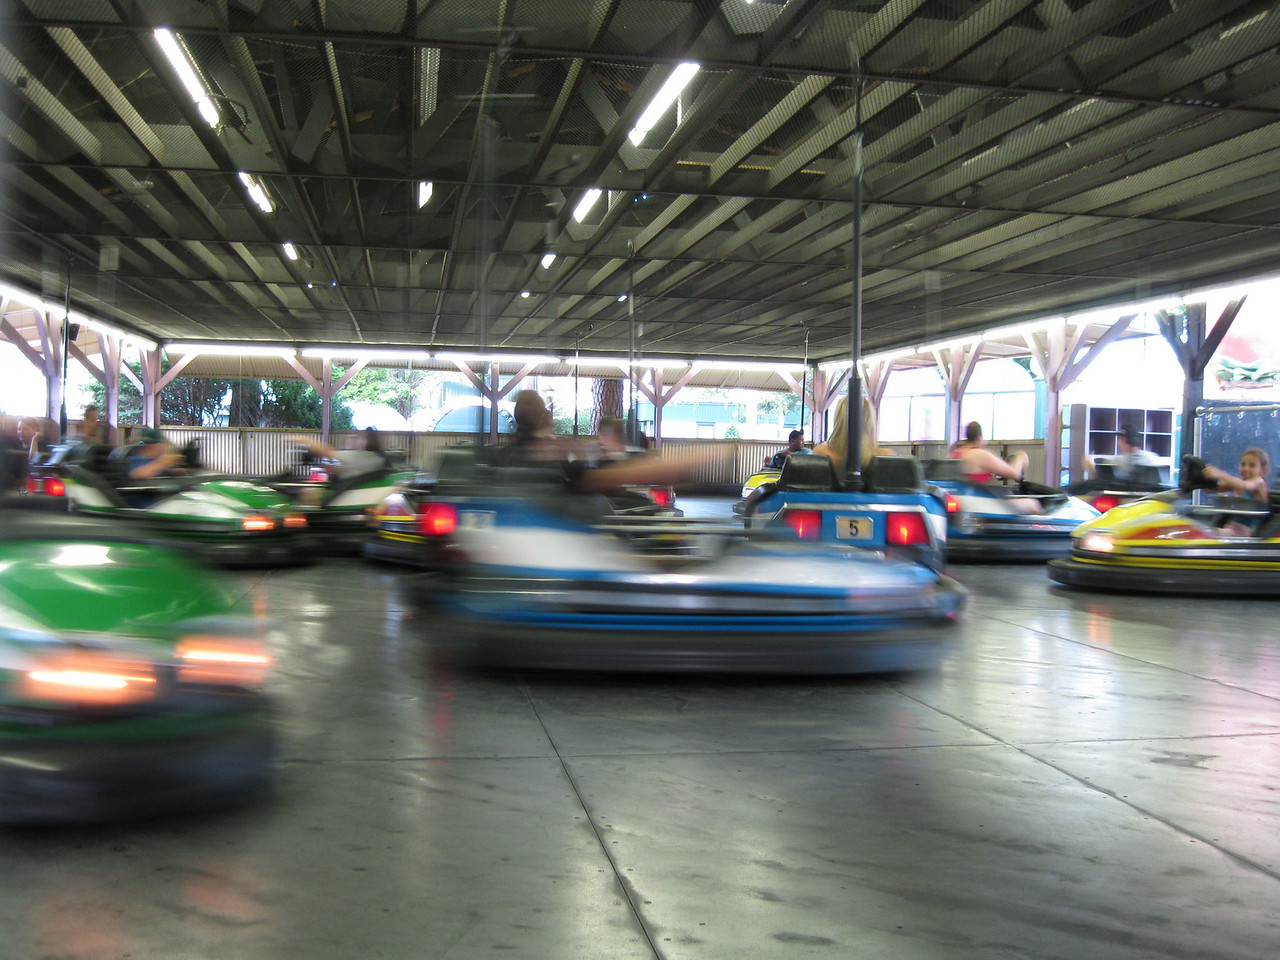 Dodgem cars in motion.